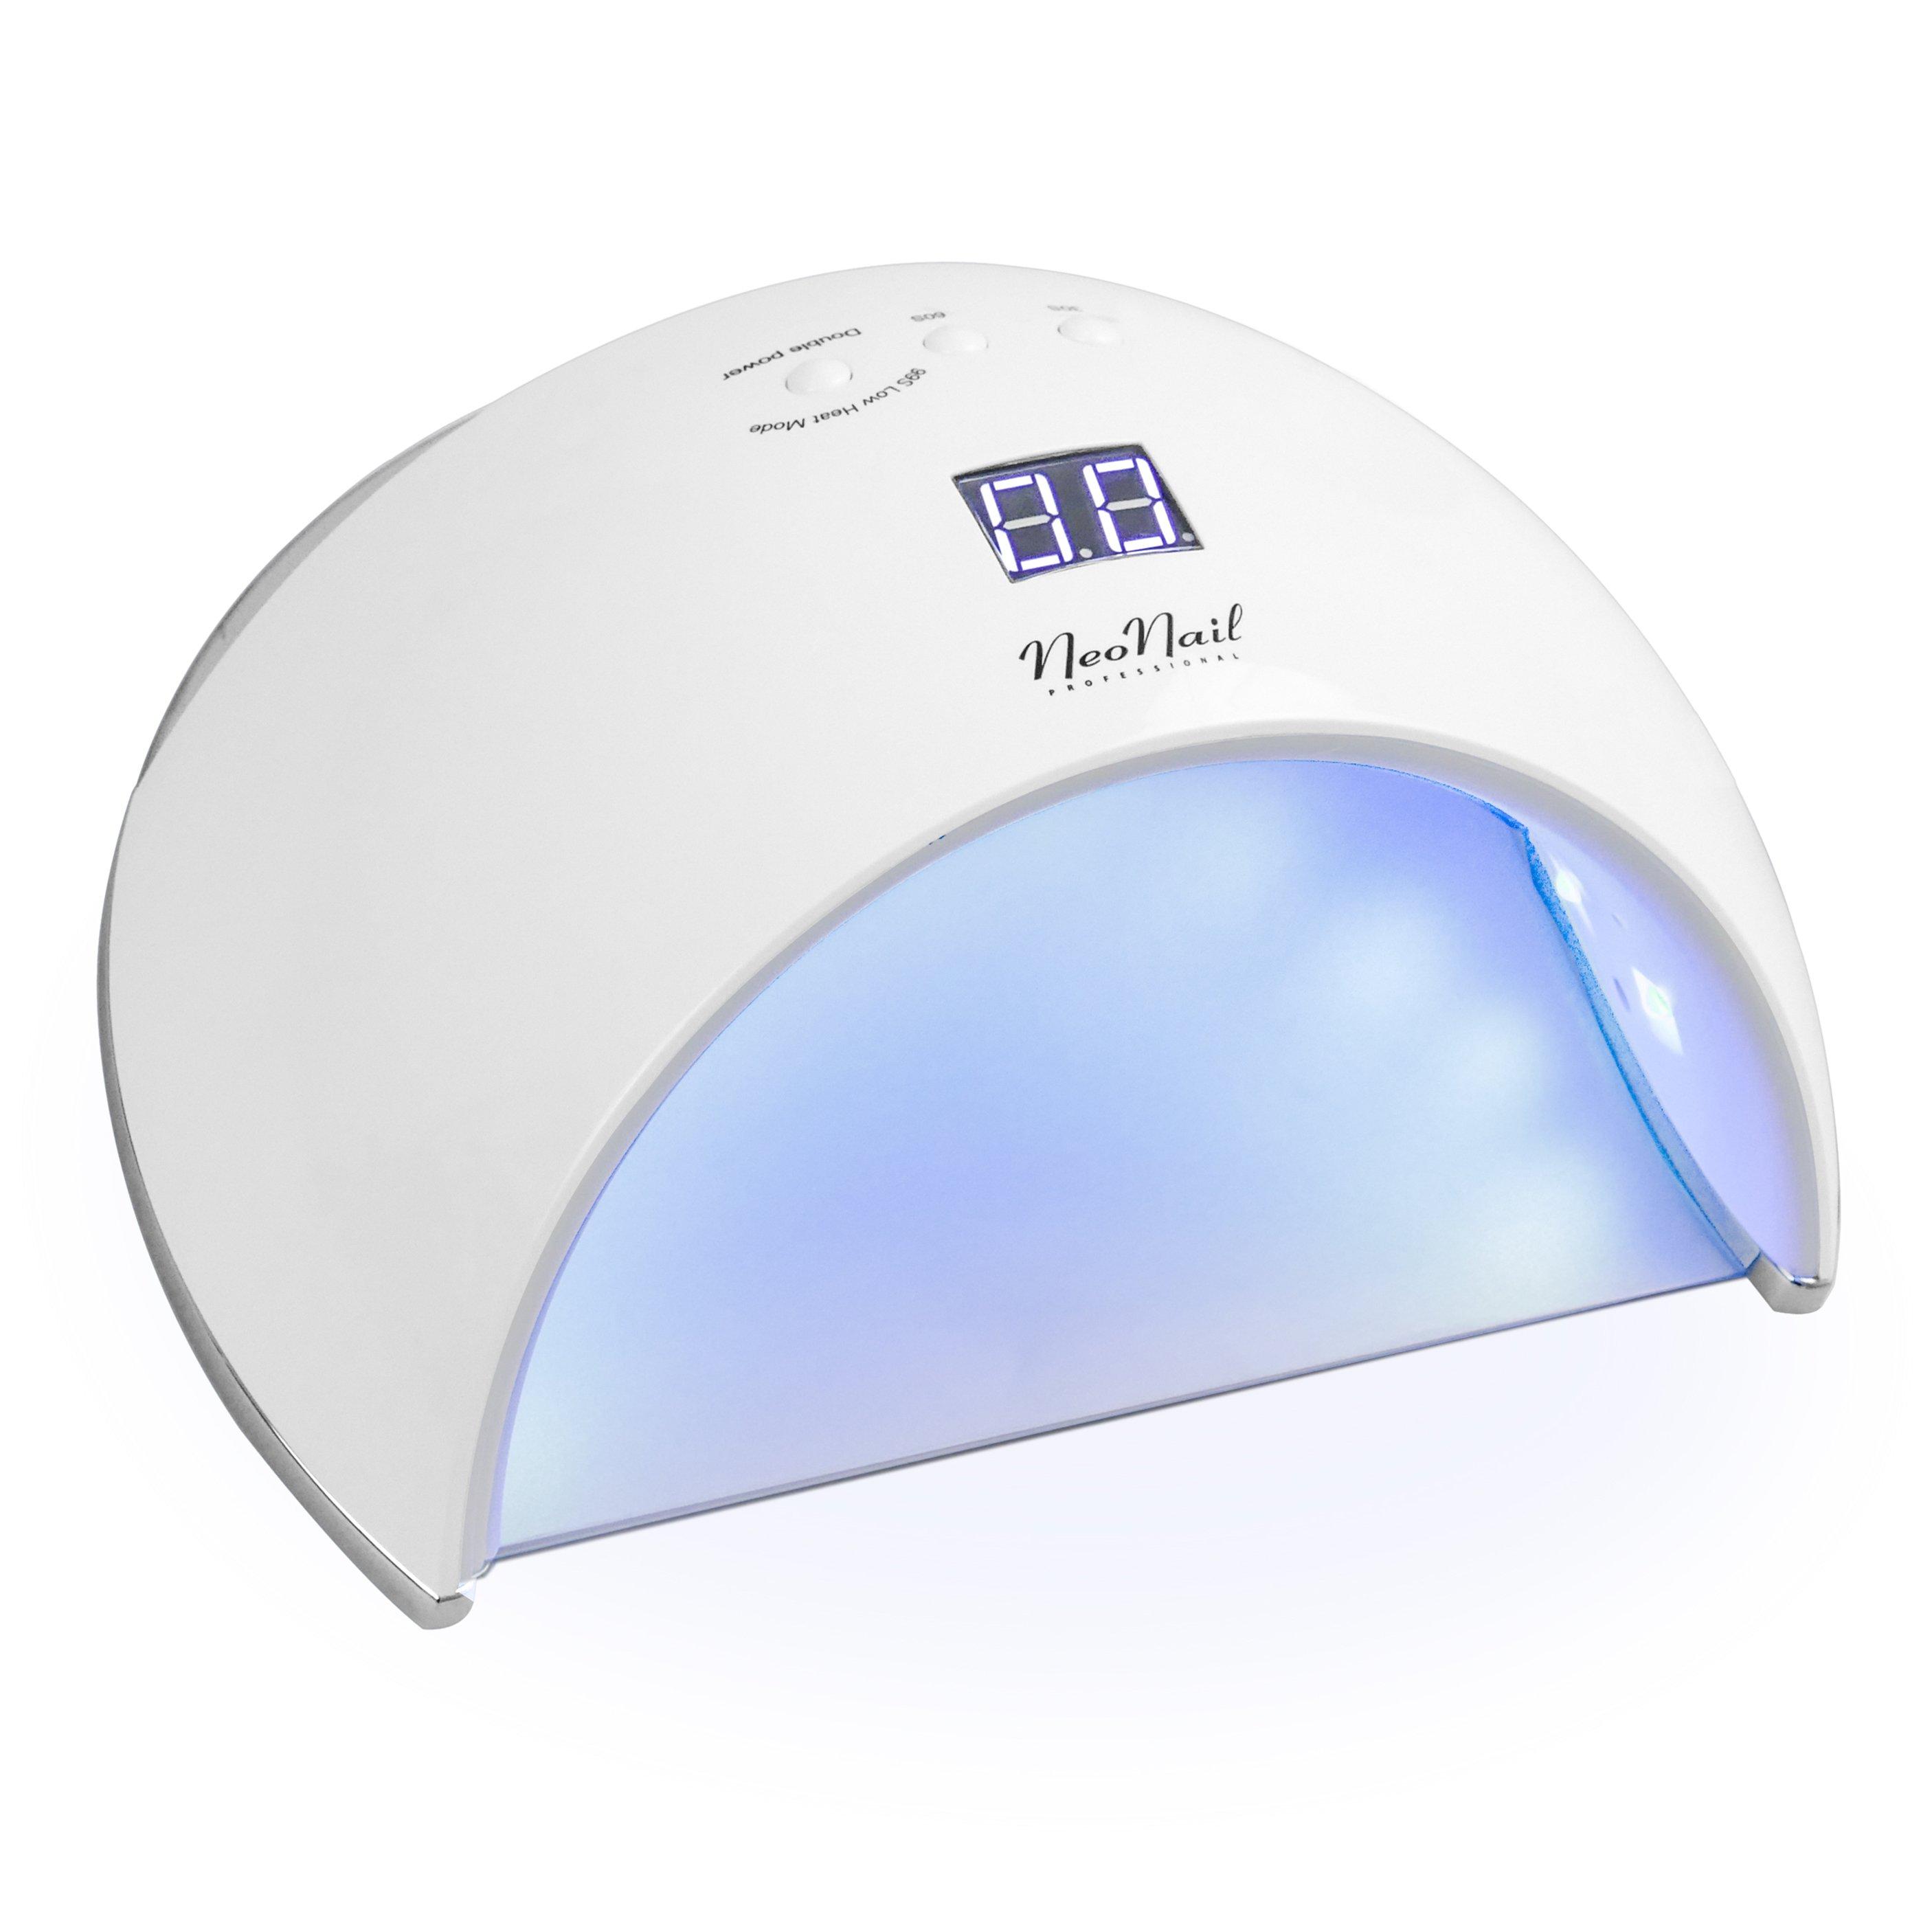 Neonail Uv Led Lampa 24 48 W 2 V 1 Naninails Cz